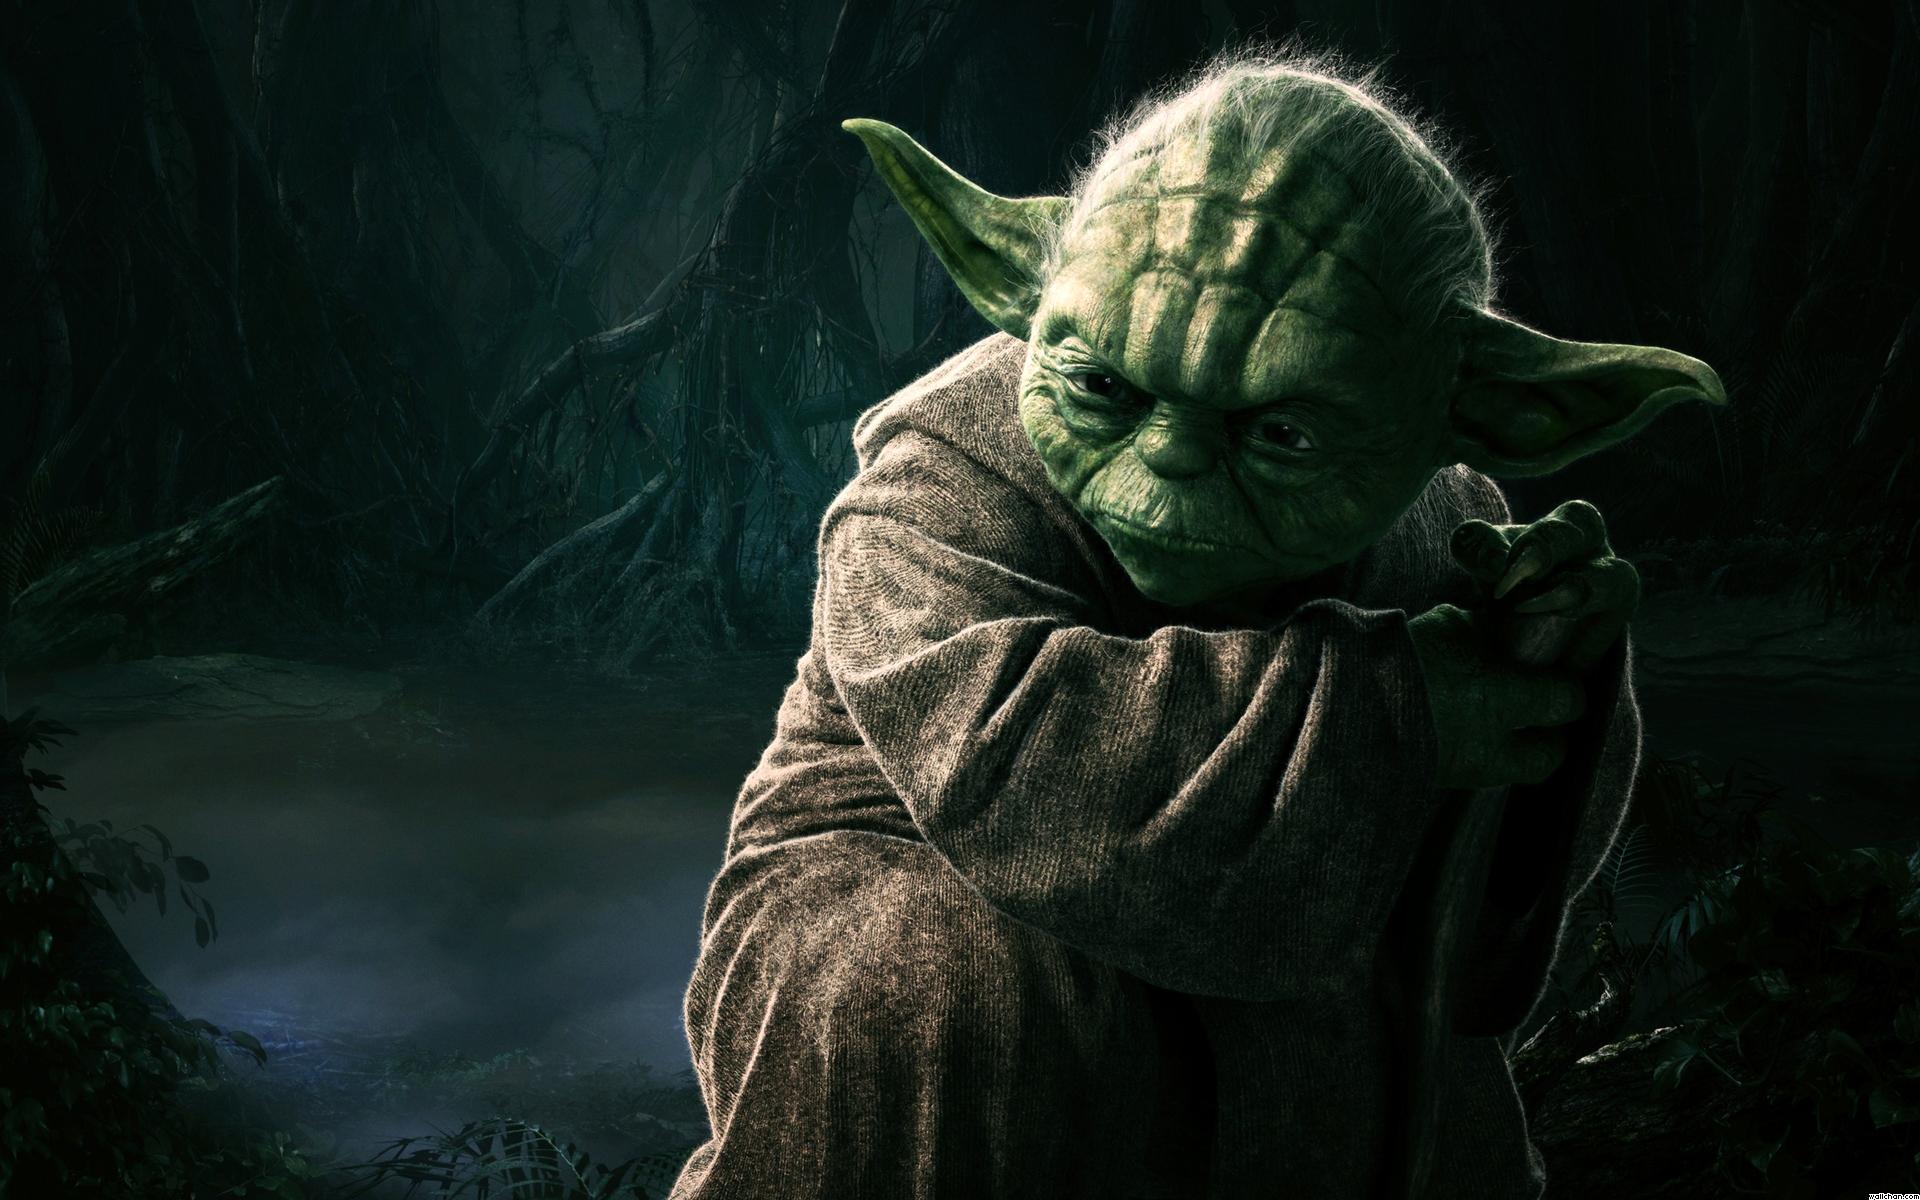 Download Yoda Star Wars HD Wallpaper 1593 Full Size 1920x1200